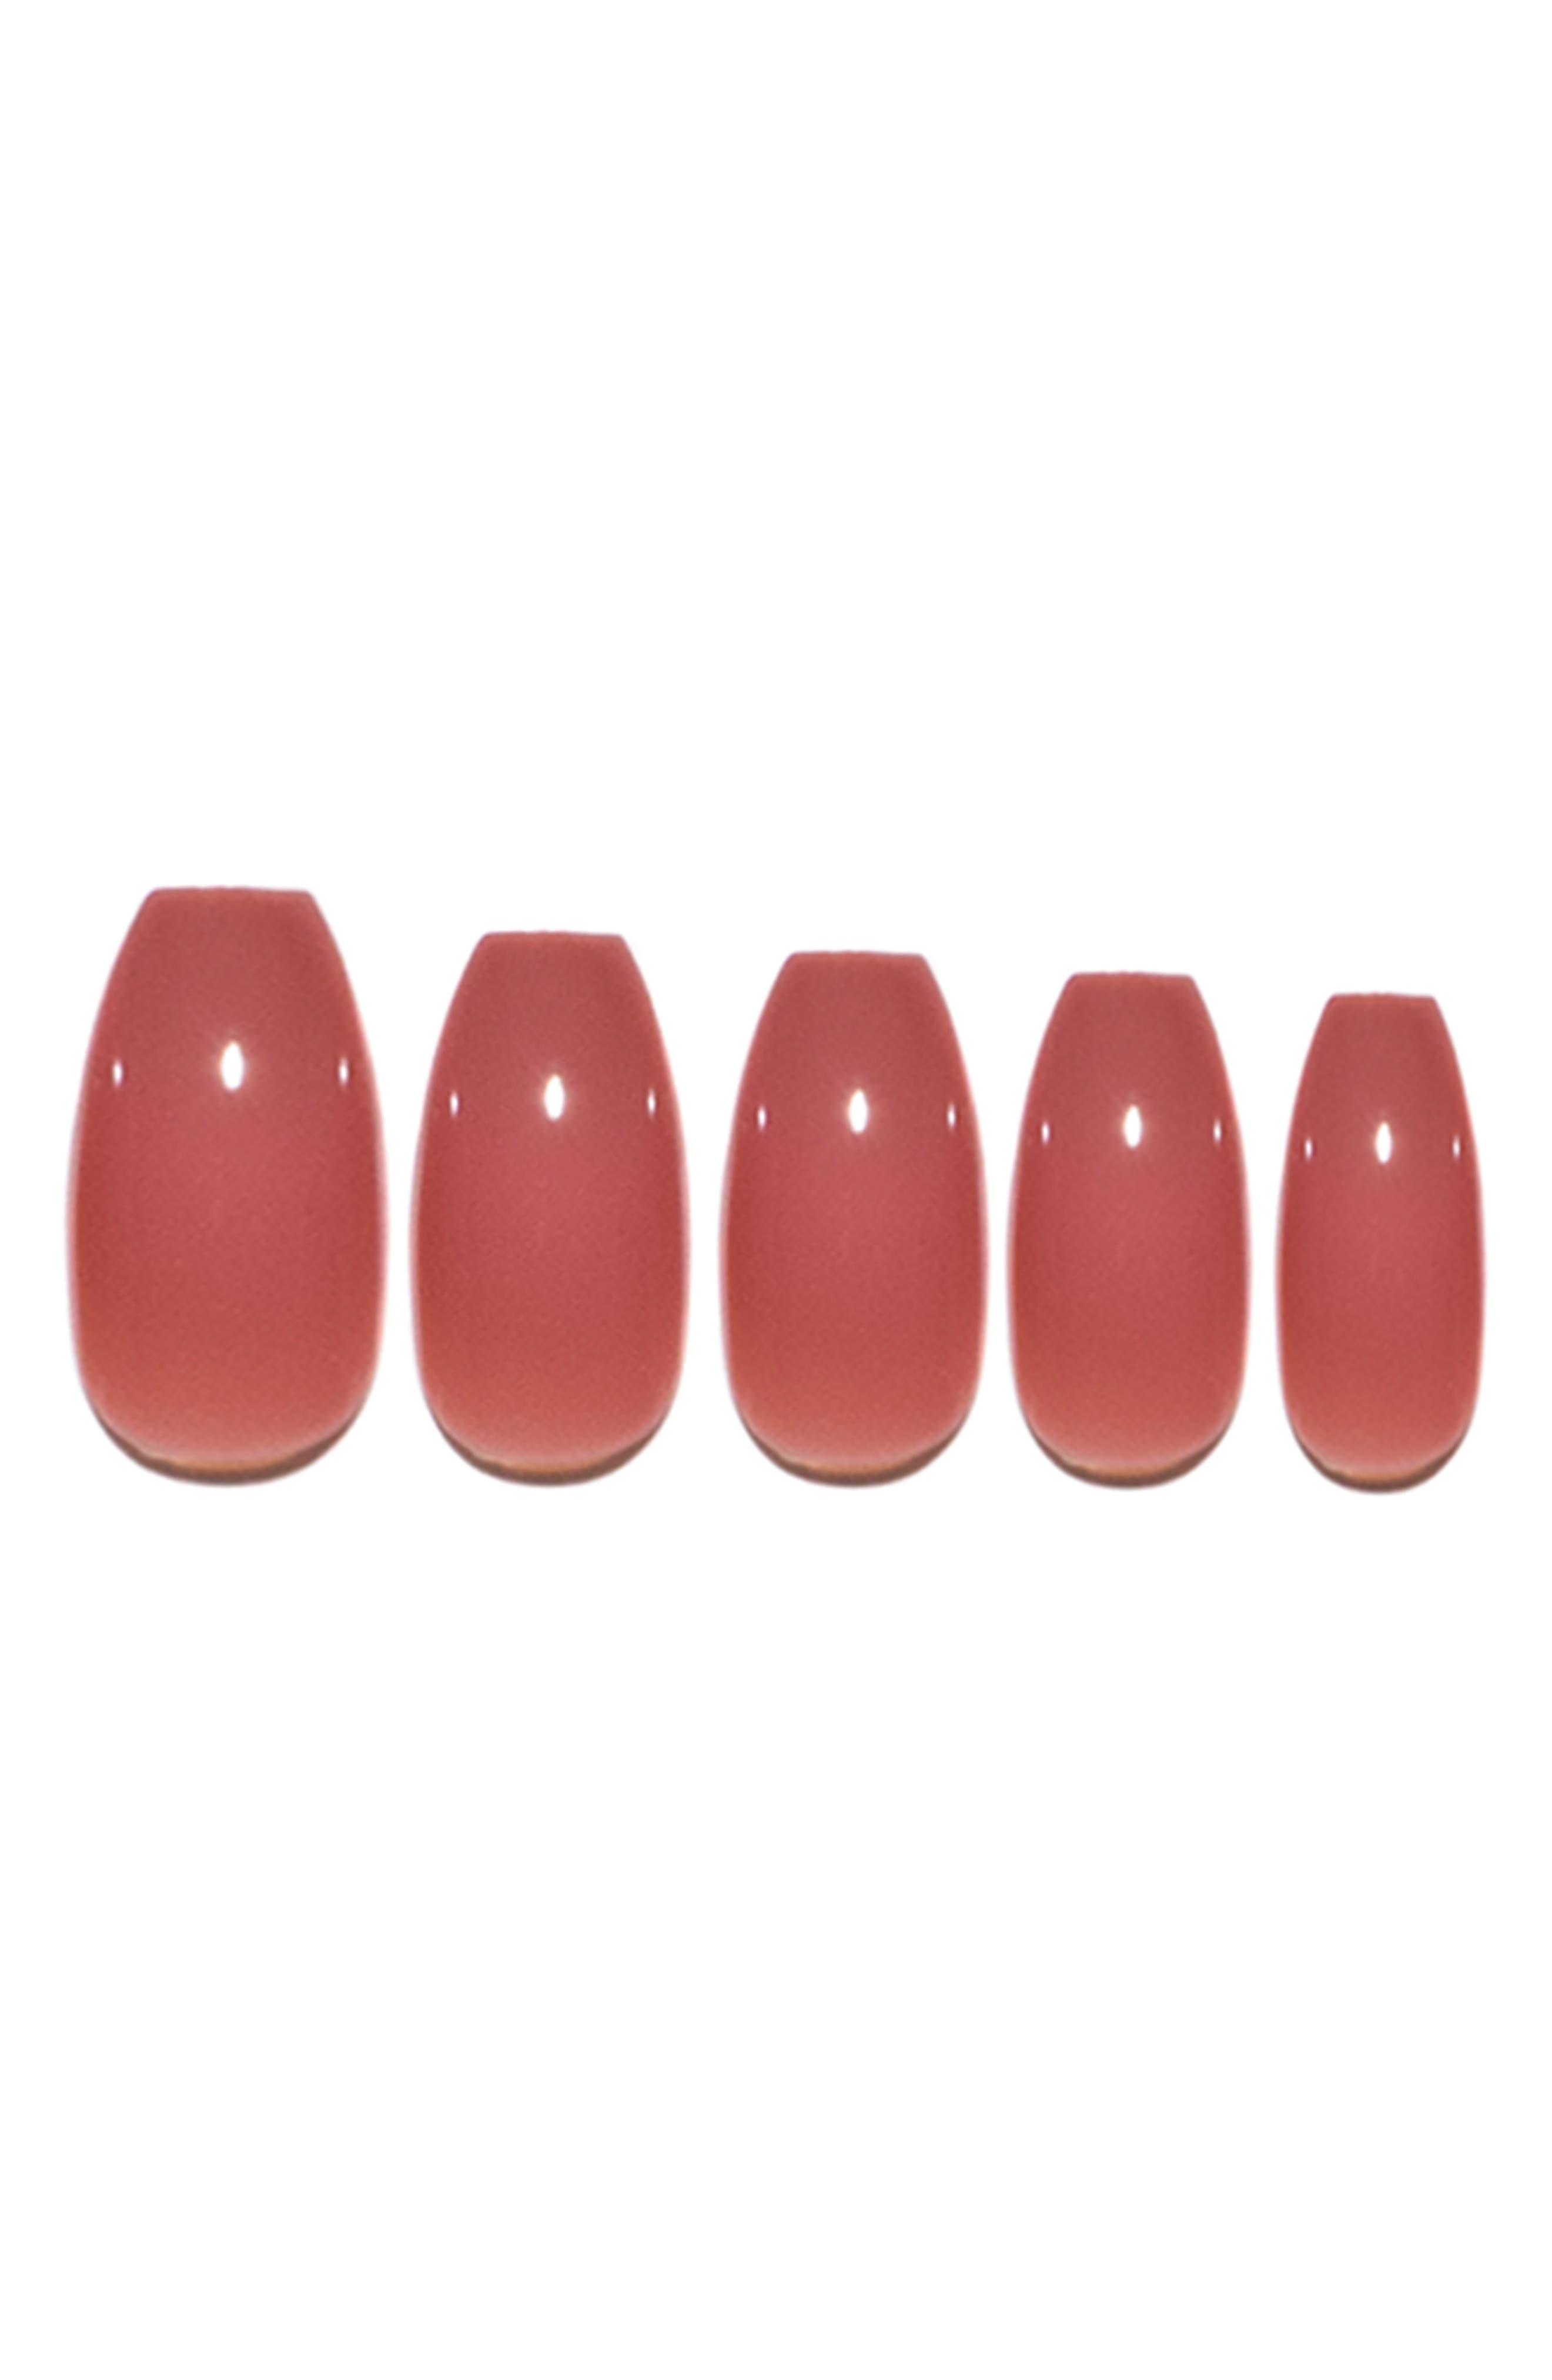 Dusty Rose Pop-On Reusable Manicure Set, Main, color, DUSTY ROSE